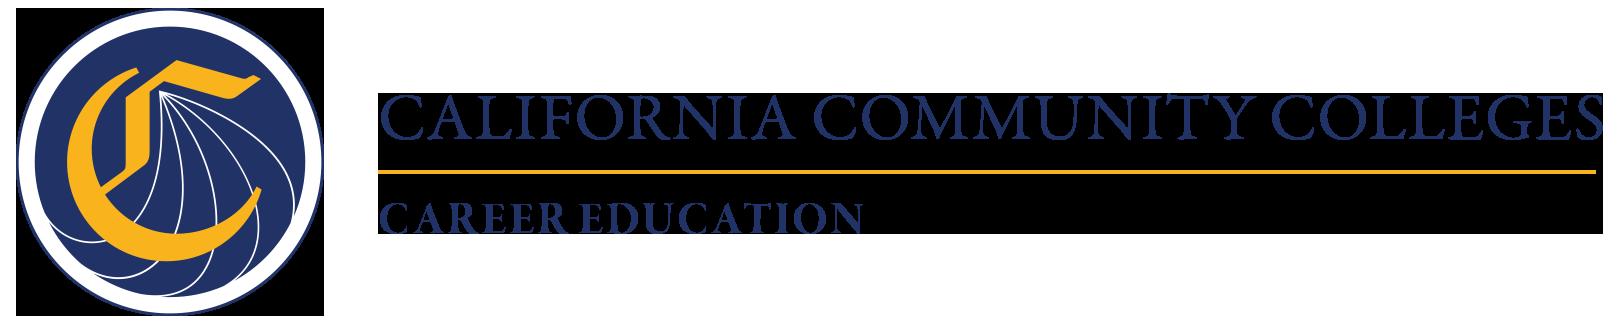 California Community Colleges Career Education Toolkit